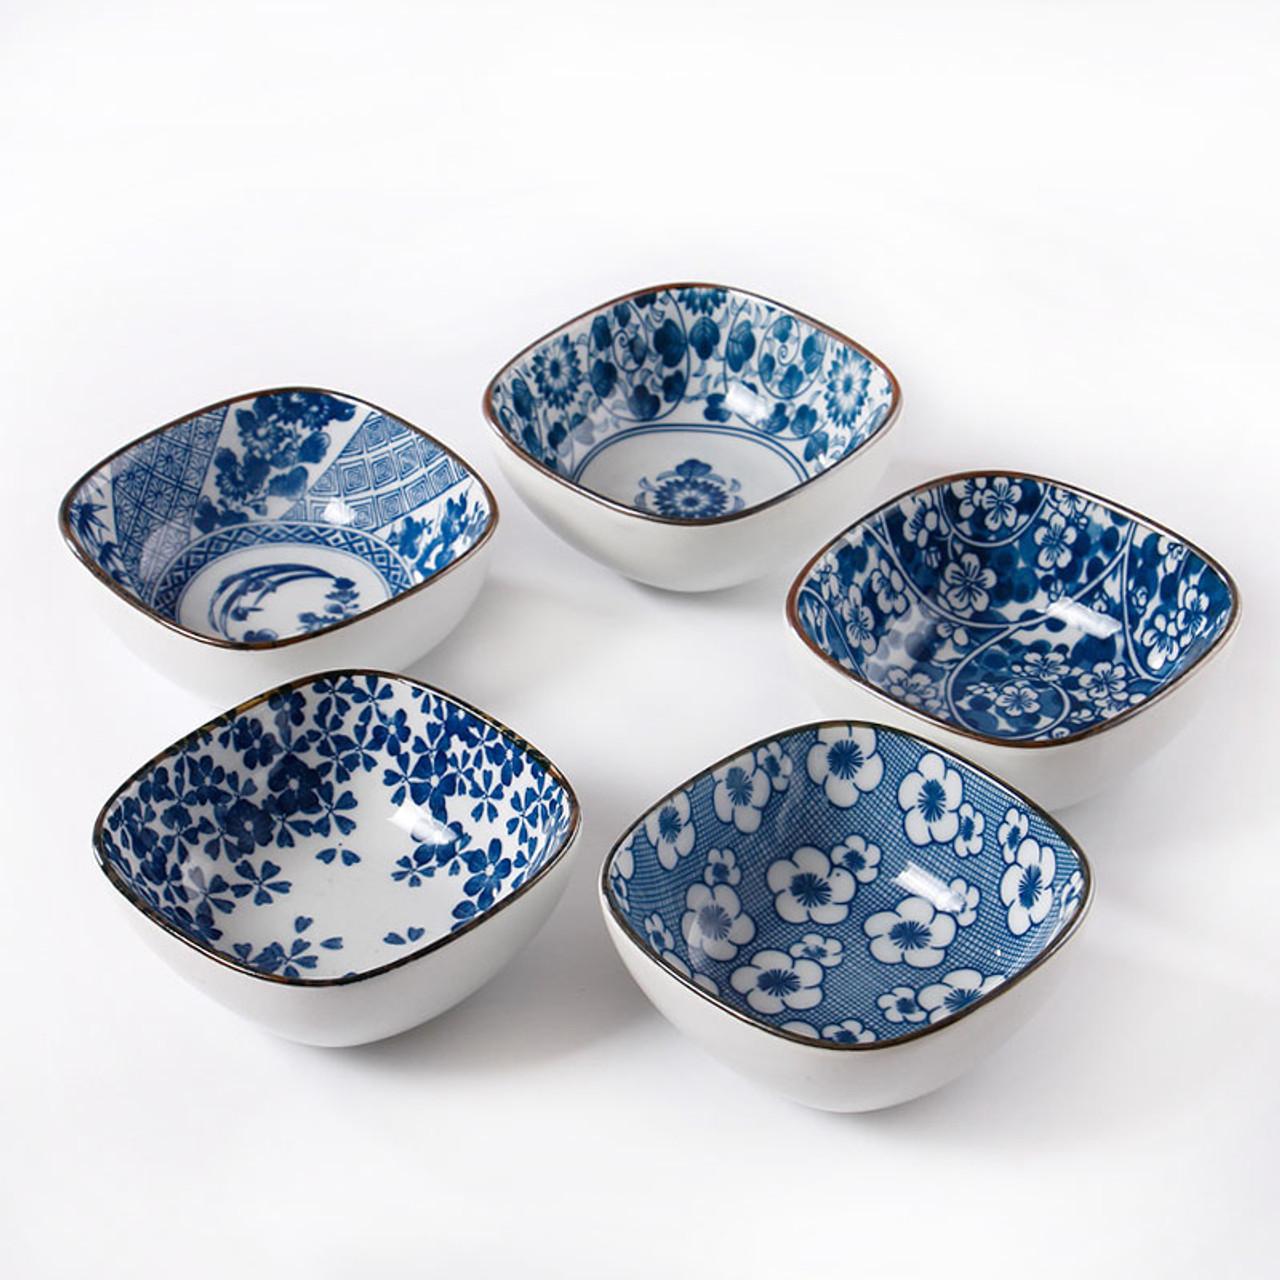 Square dish Celadon Oribe Sinkish Sushi dish size Clay 1100g Japanese dish plates traditional oriental asian 31.8 x 21cm